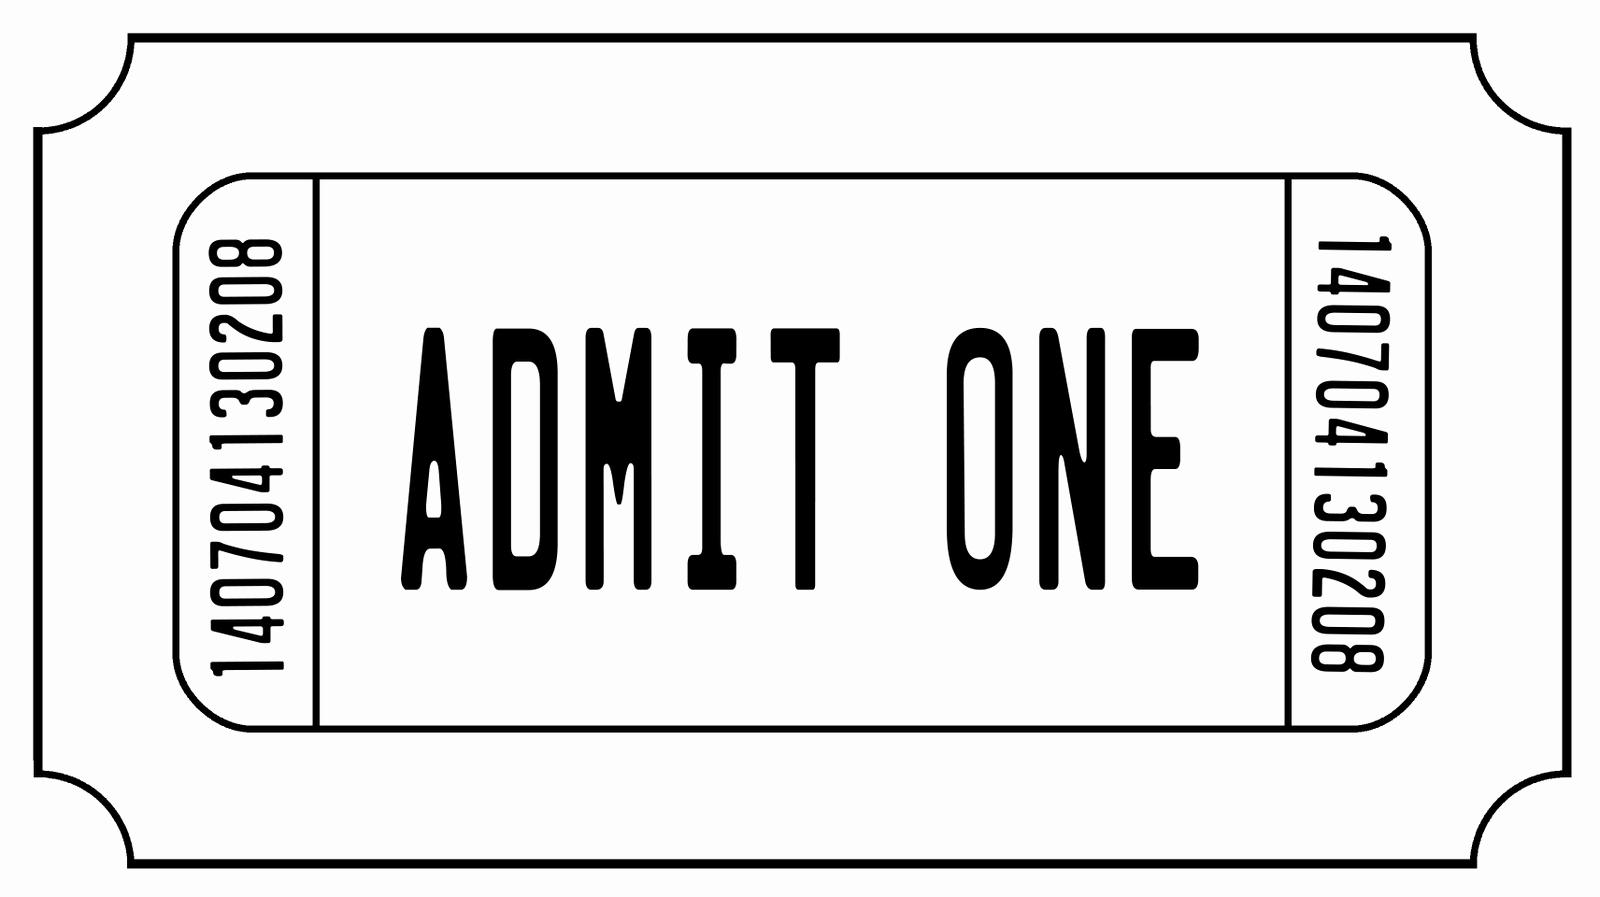 Admit One Movie Ticket Template Inspirational Admit One Ticket Digi Stamp Digital Stamps